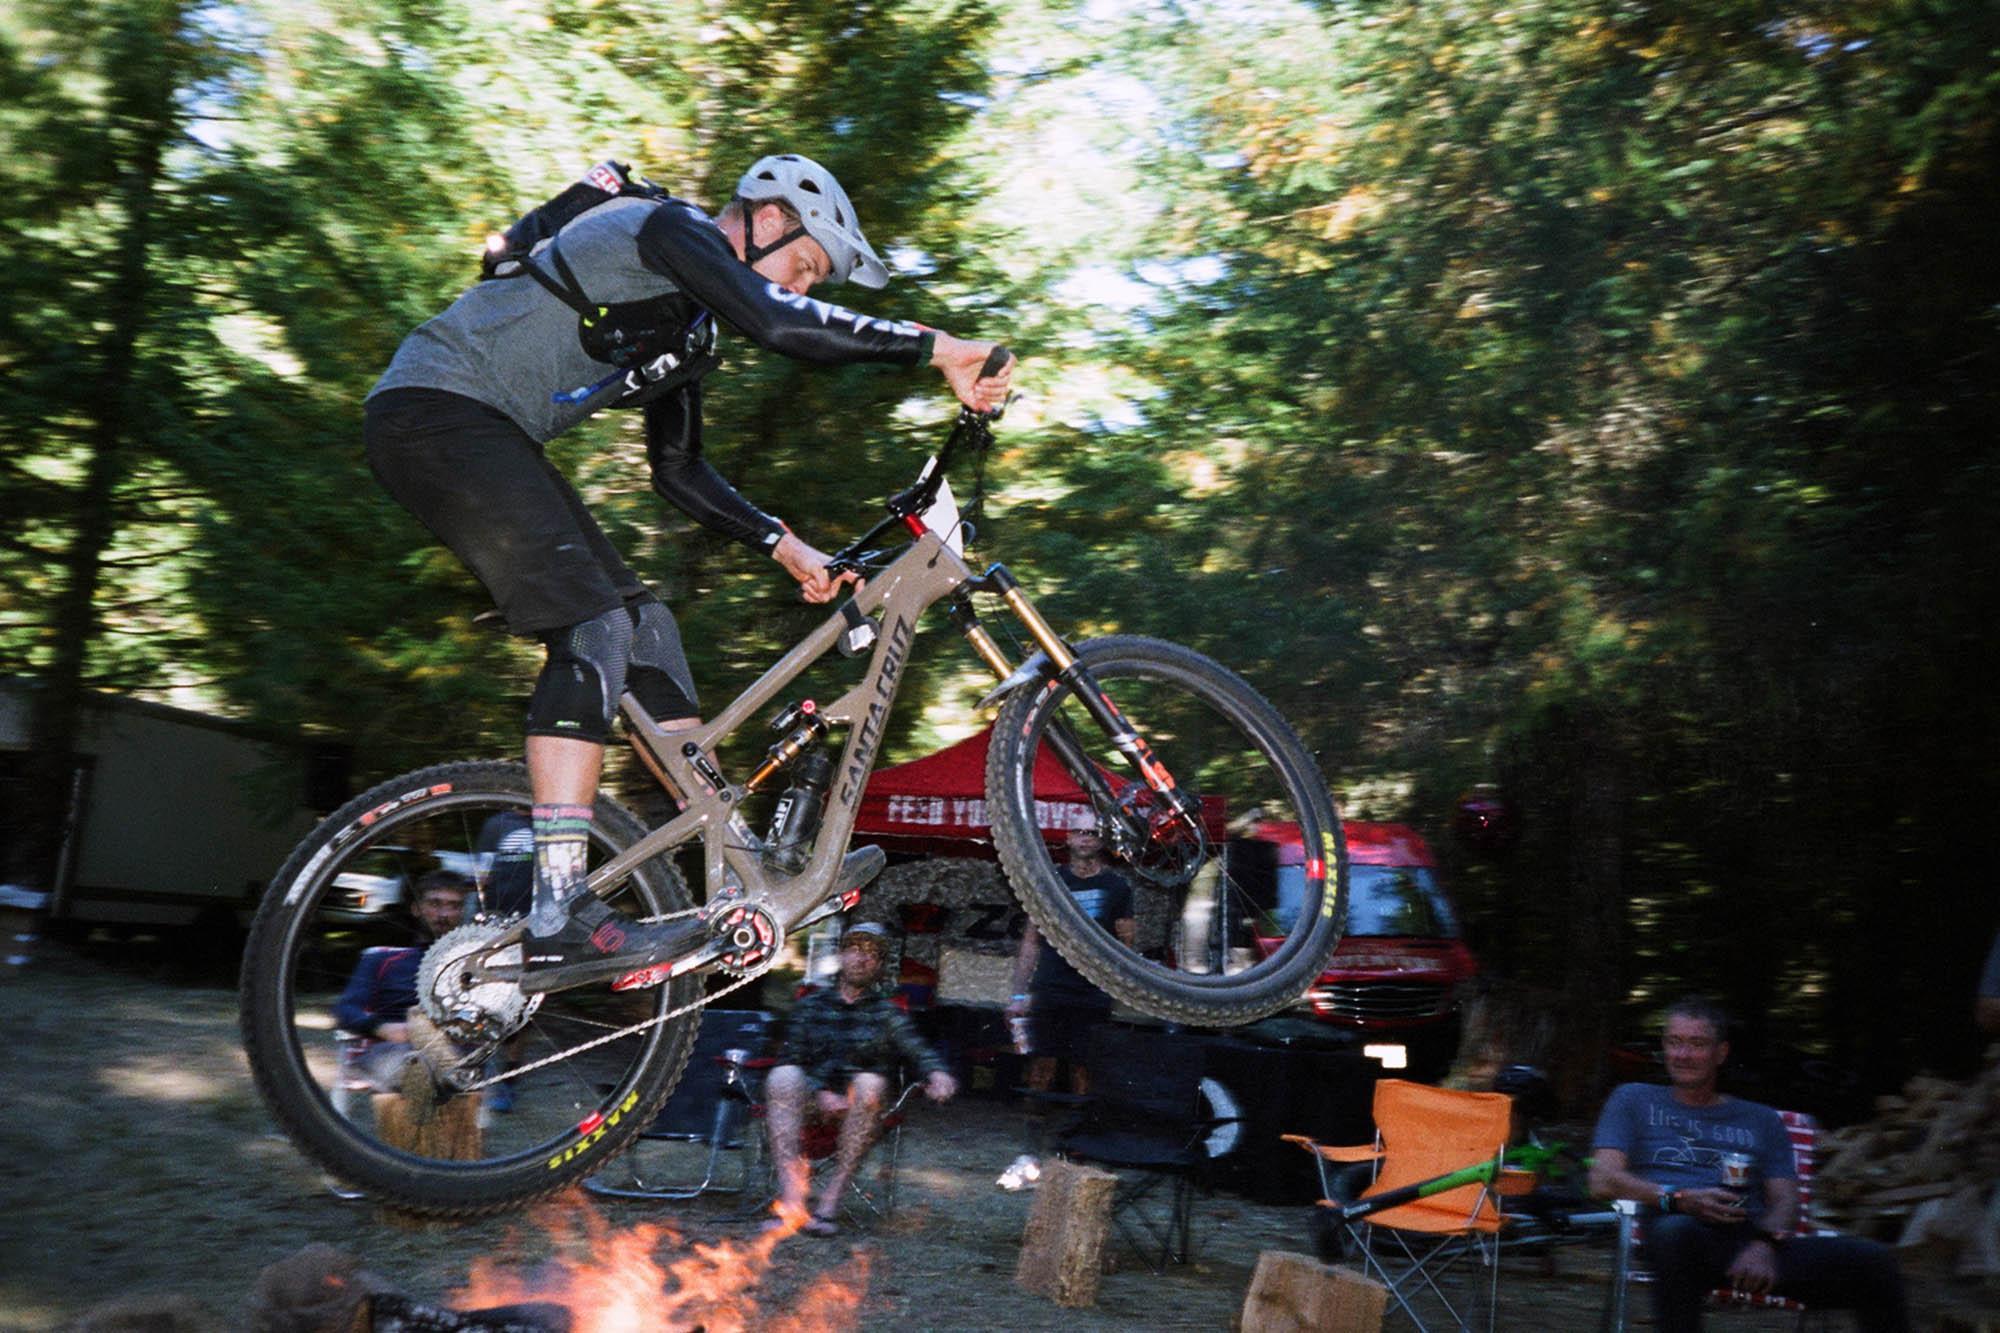 Greg Minnaar - Photo by Jeremy Dunn